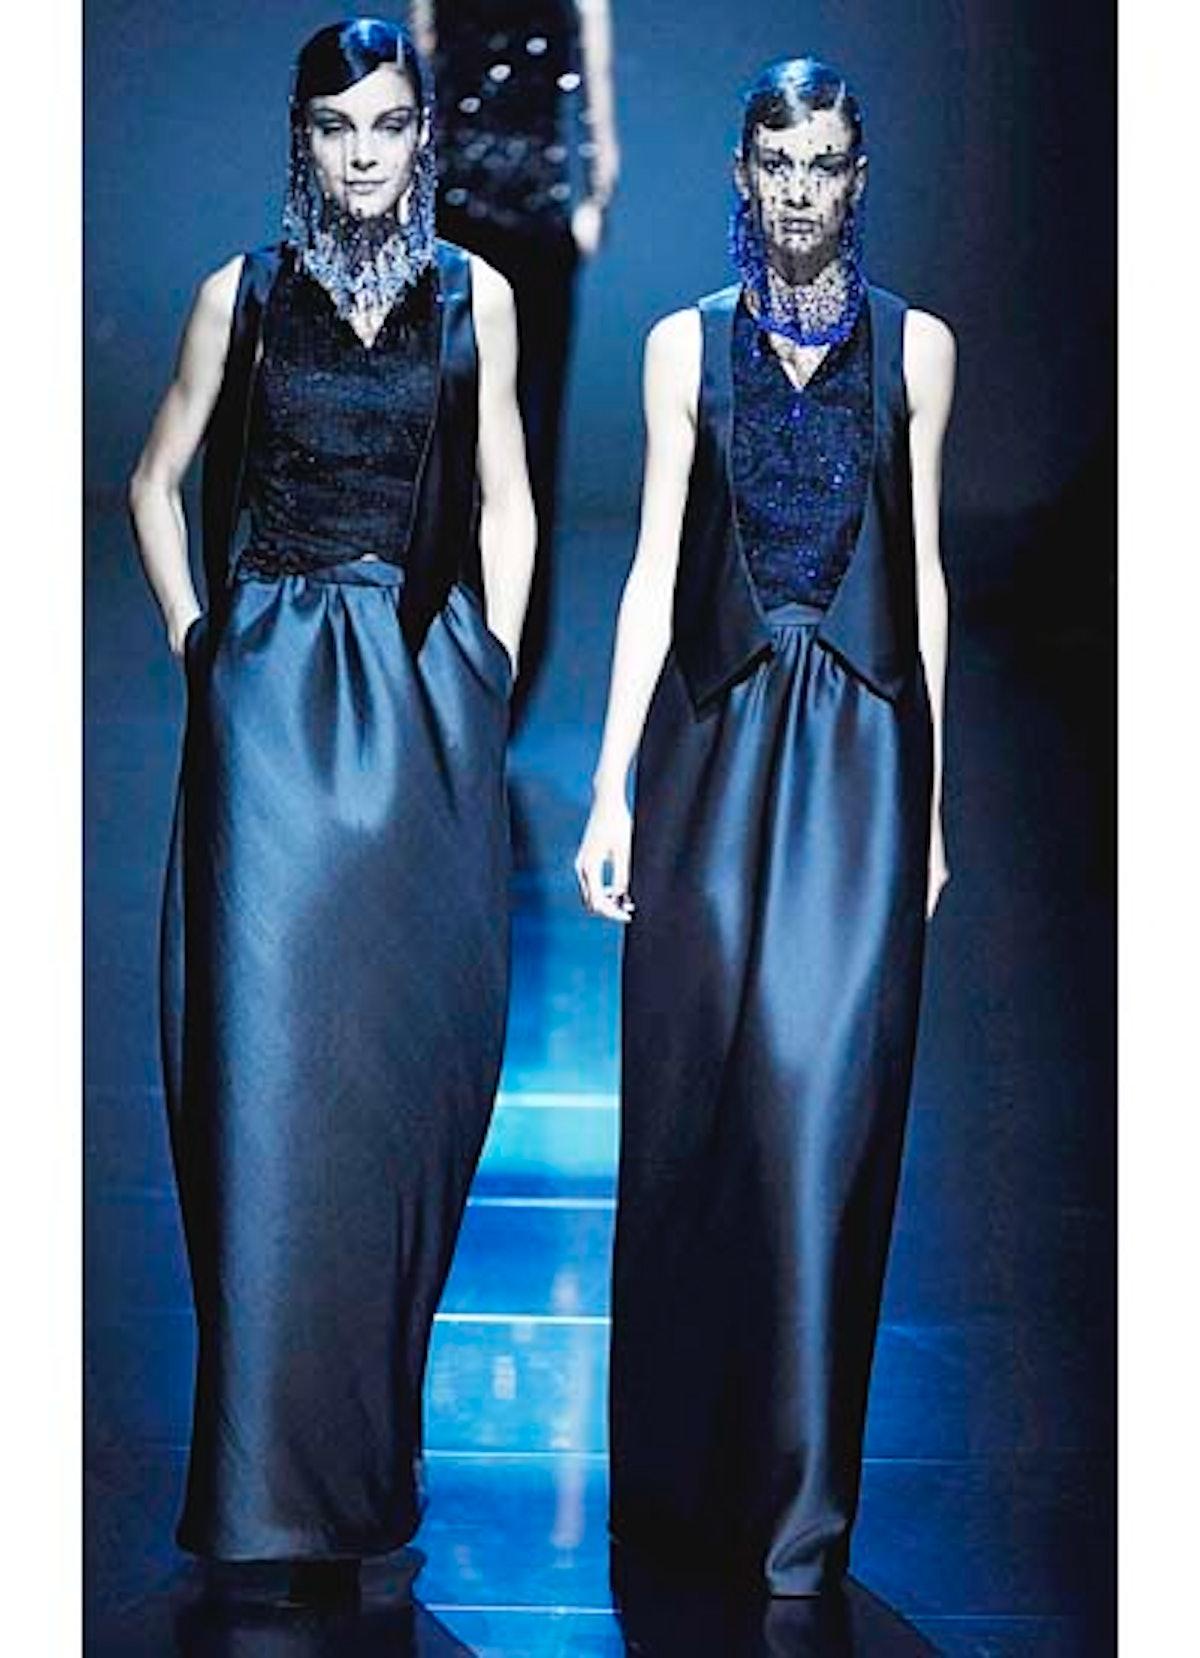 fass-giorgio-armani-couture-2012-runway-42-v.jpg